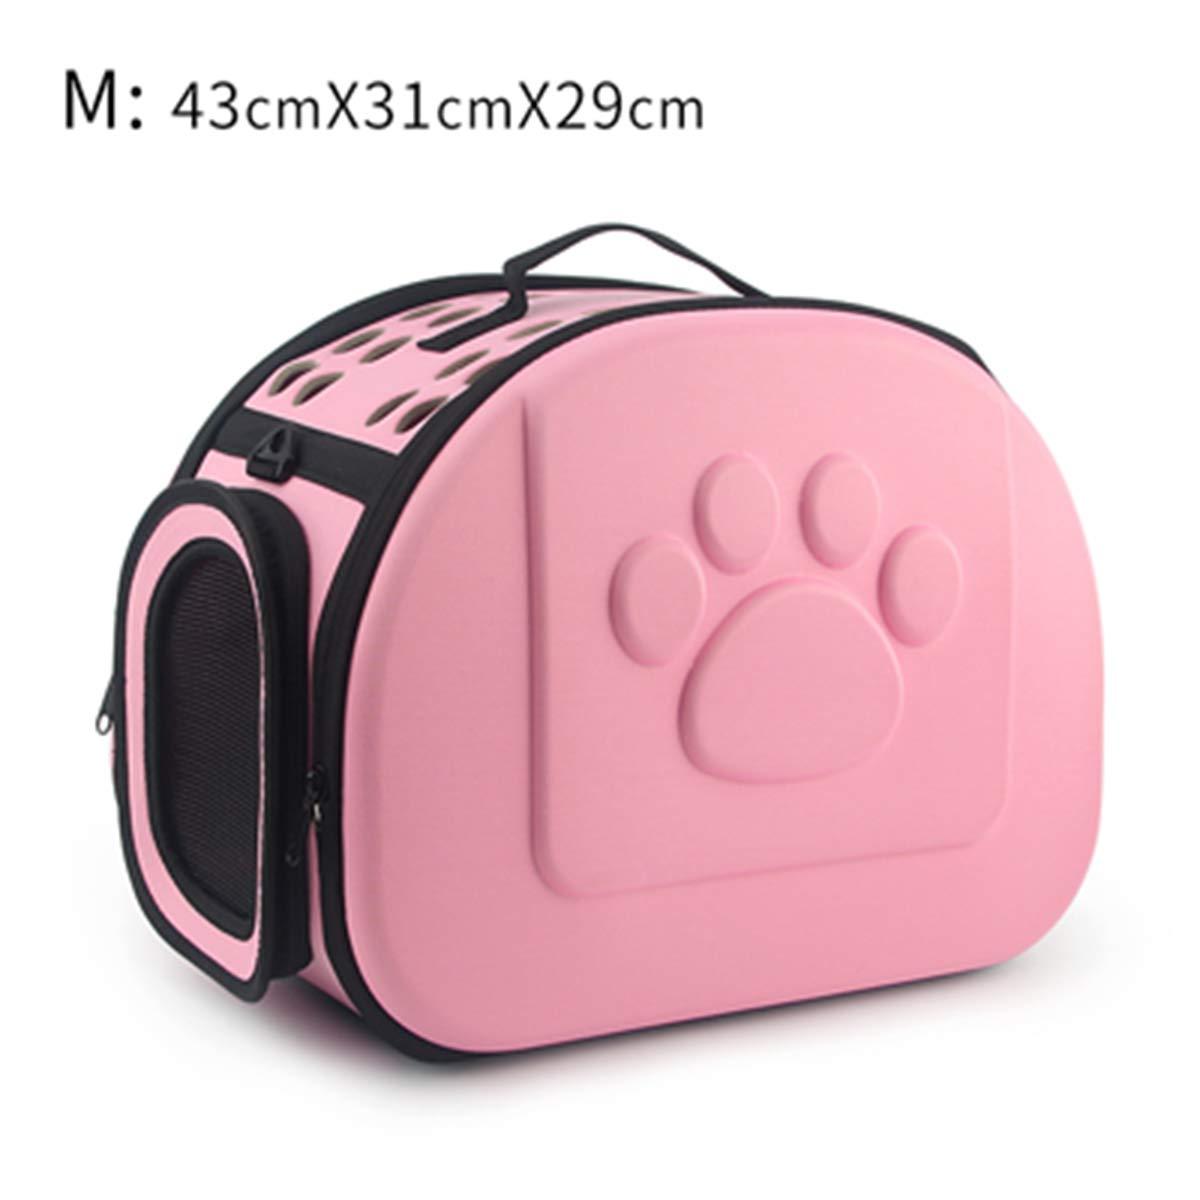 Pink 43x31x29cm M As PicturePETFDH Pure color Pet Carrier Bag Portable Outdoor Solid color Cat Foldable Dog Travel Pets Bag Puppy Carrying Shoulder Bags S M L L bluee 45x32x38cm